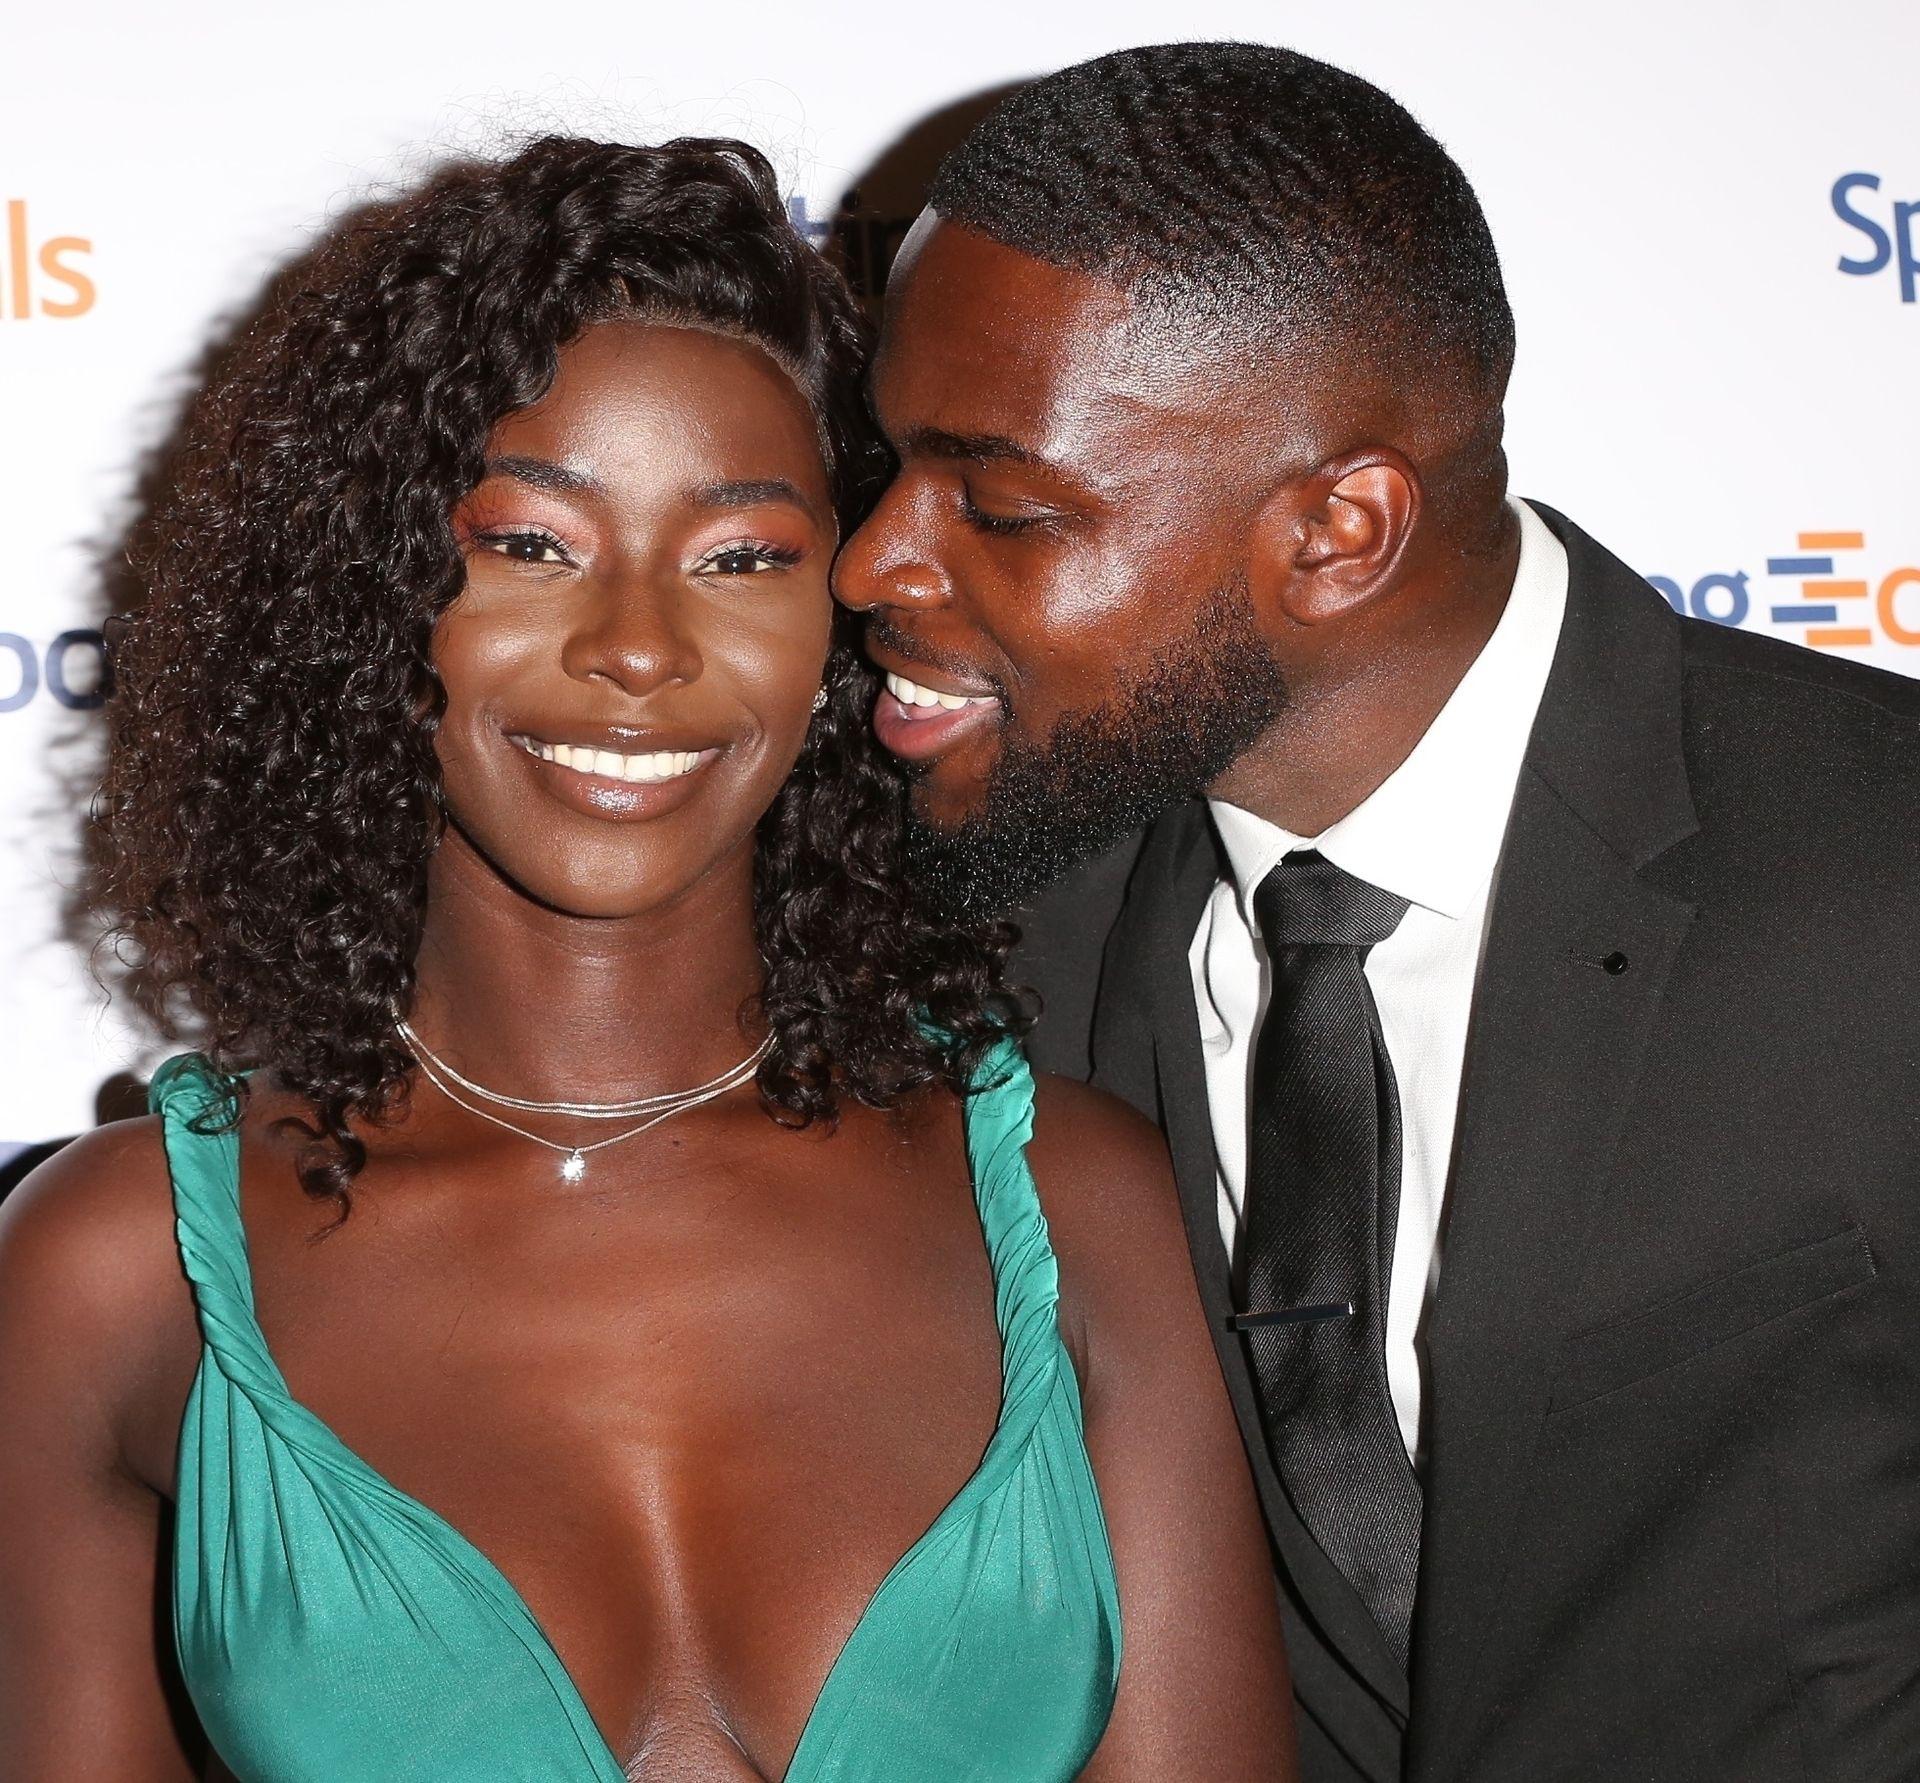 Mike Boateng & Priscilla Anyabu Are Seen At British Ethnic Diversity Sports Awards 0095